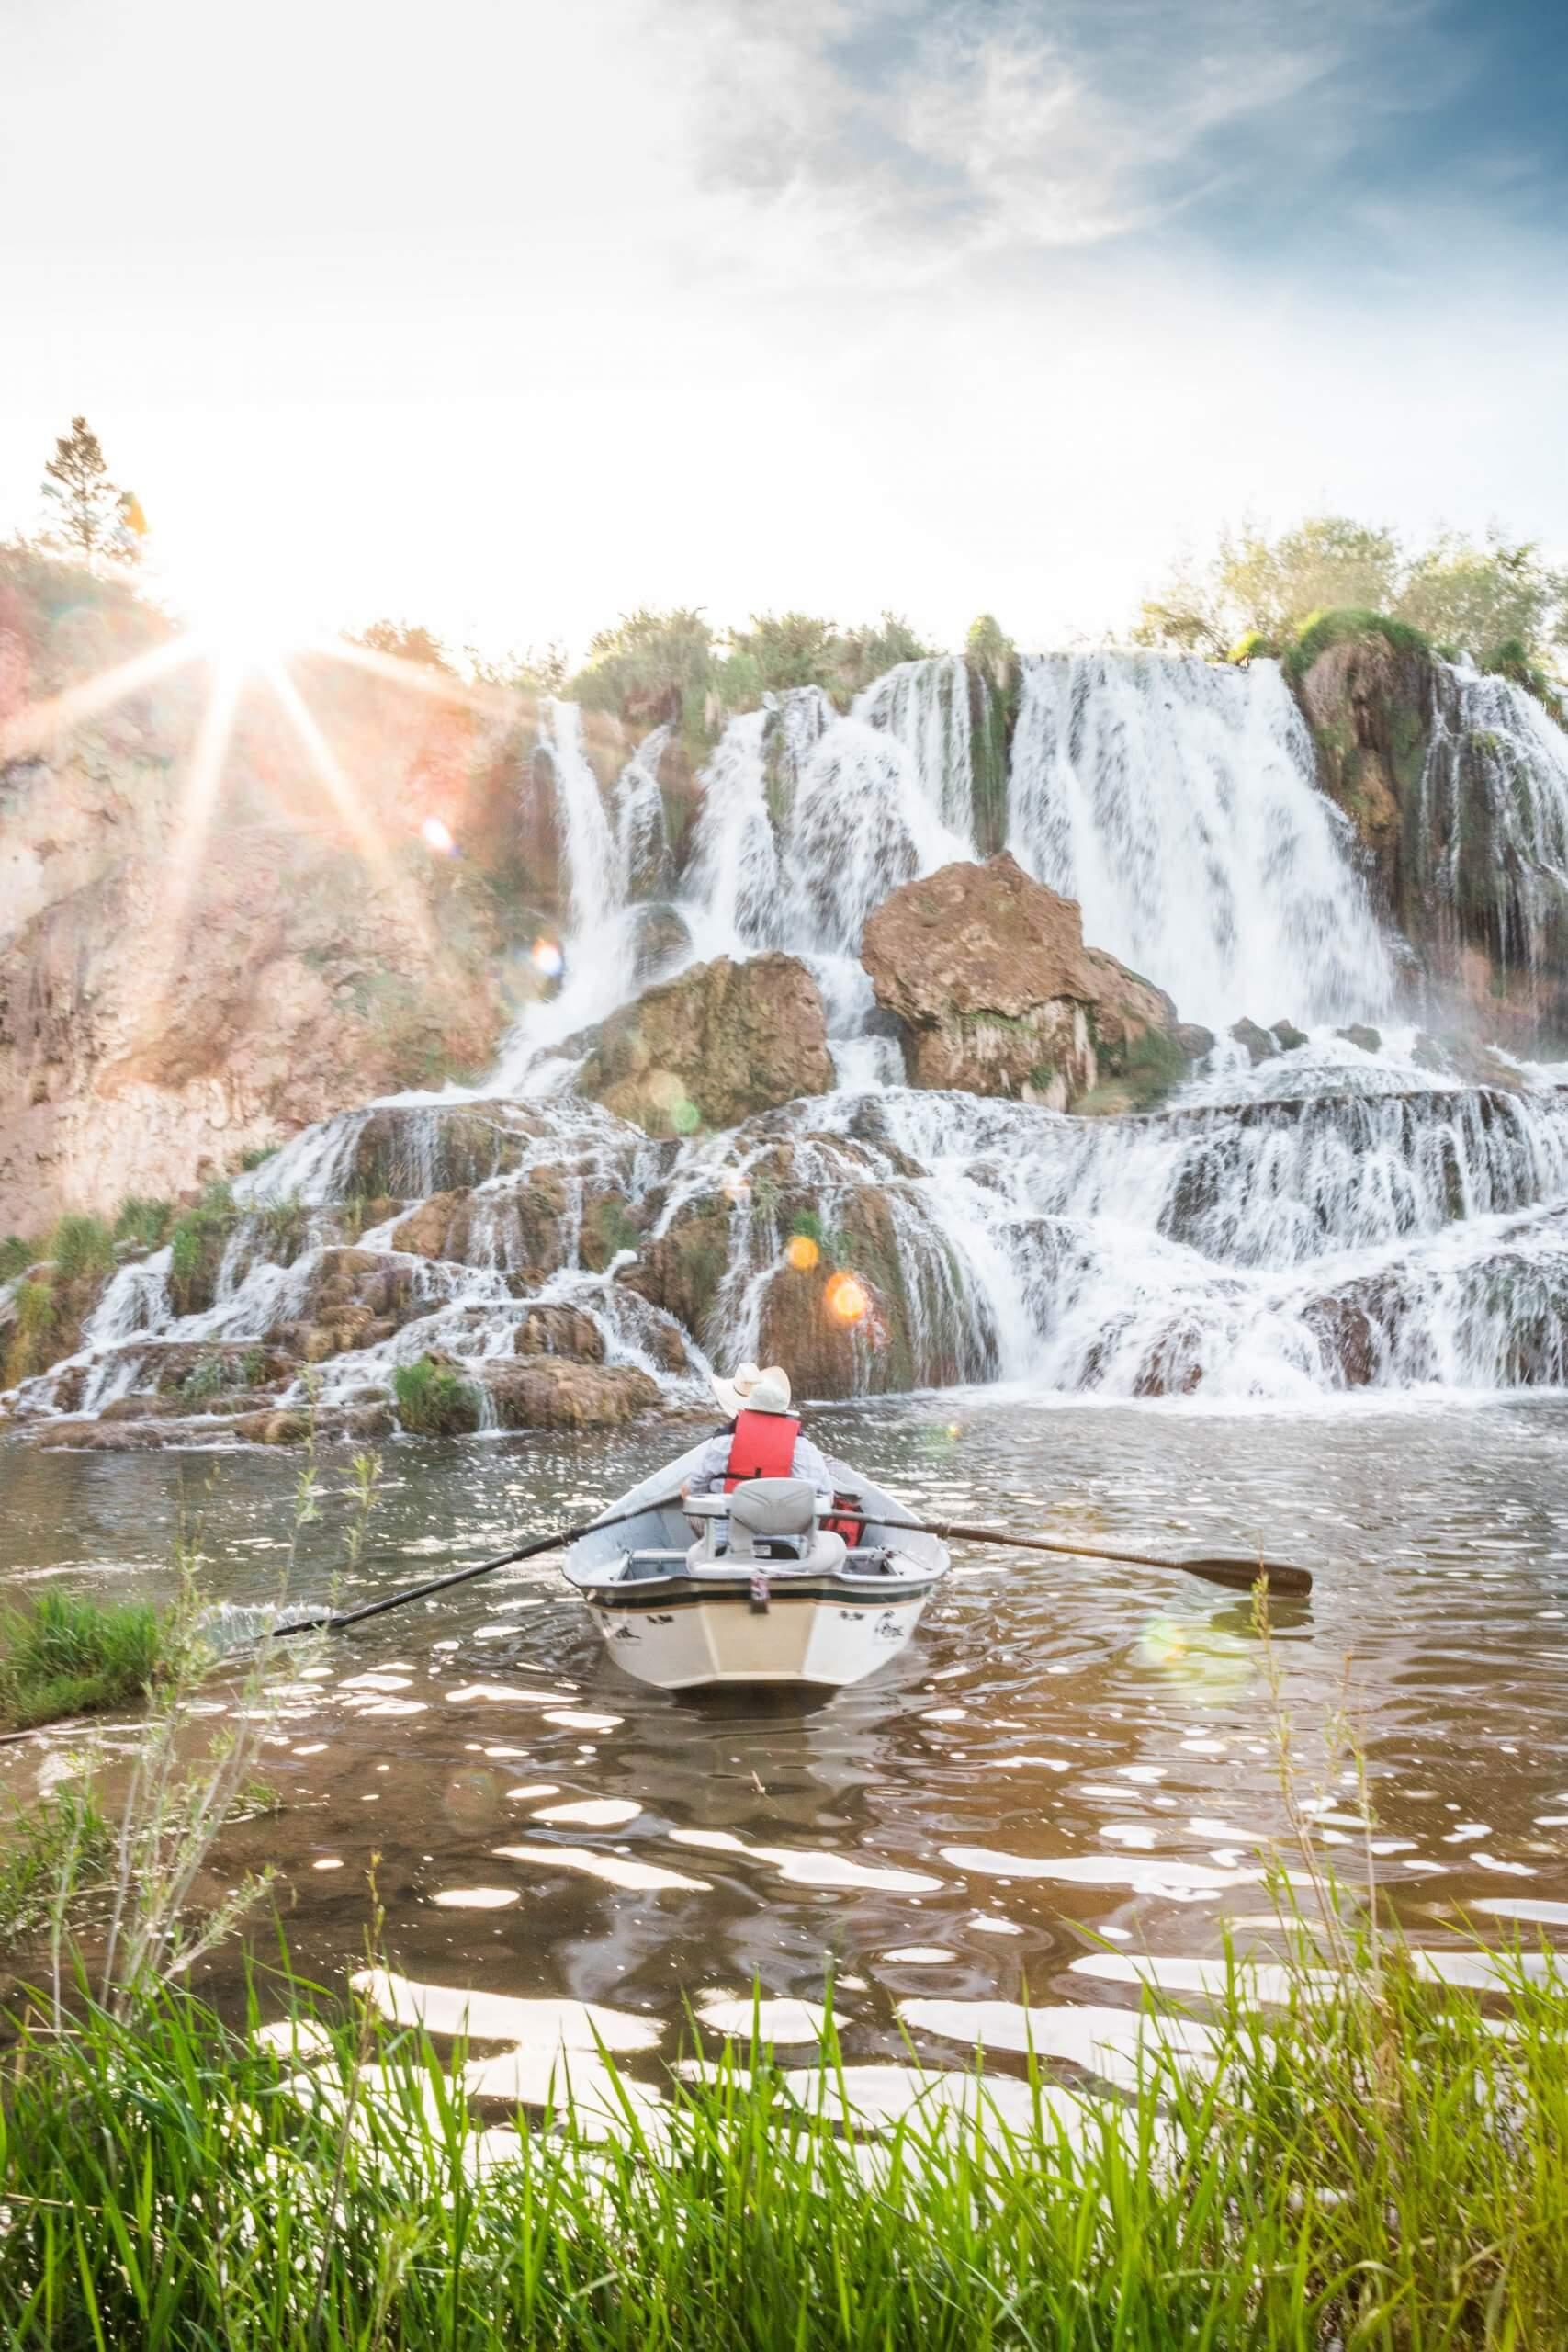 drift boat in front of waterfall